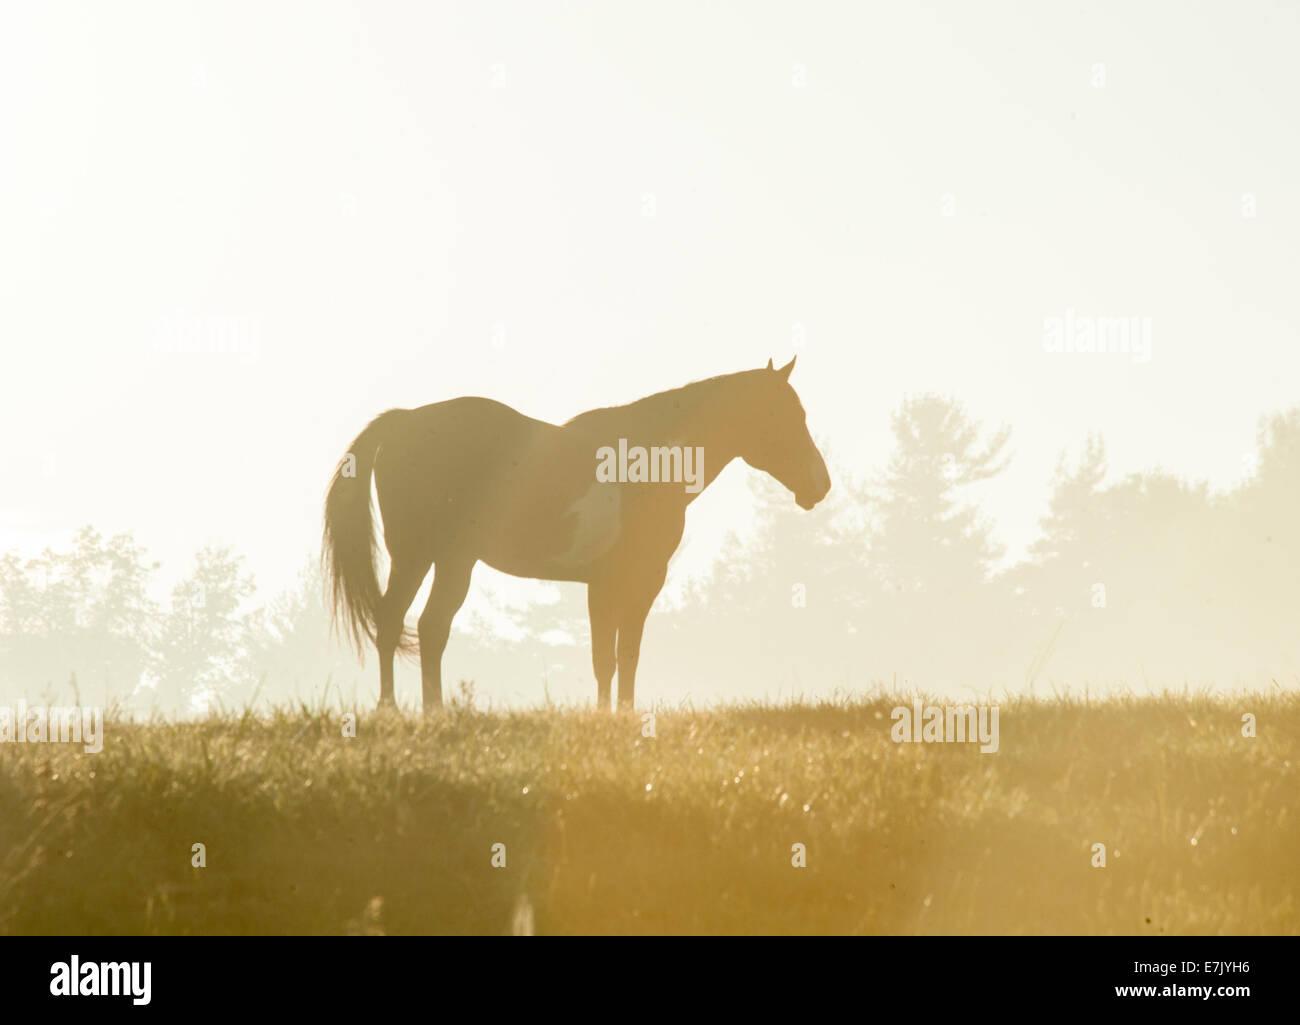 Horse silhouette in fog on horizon at sunrise - Stock Image